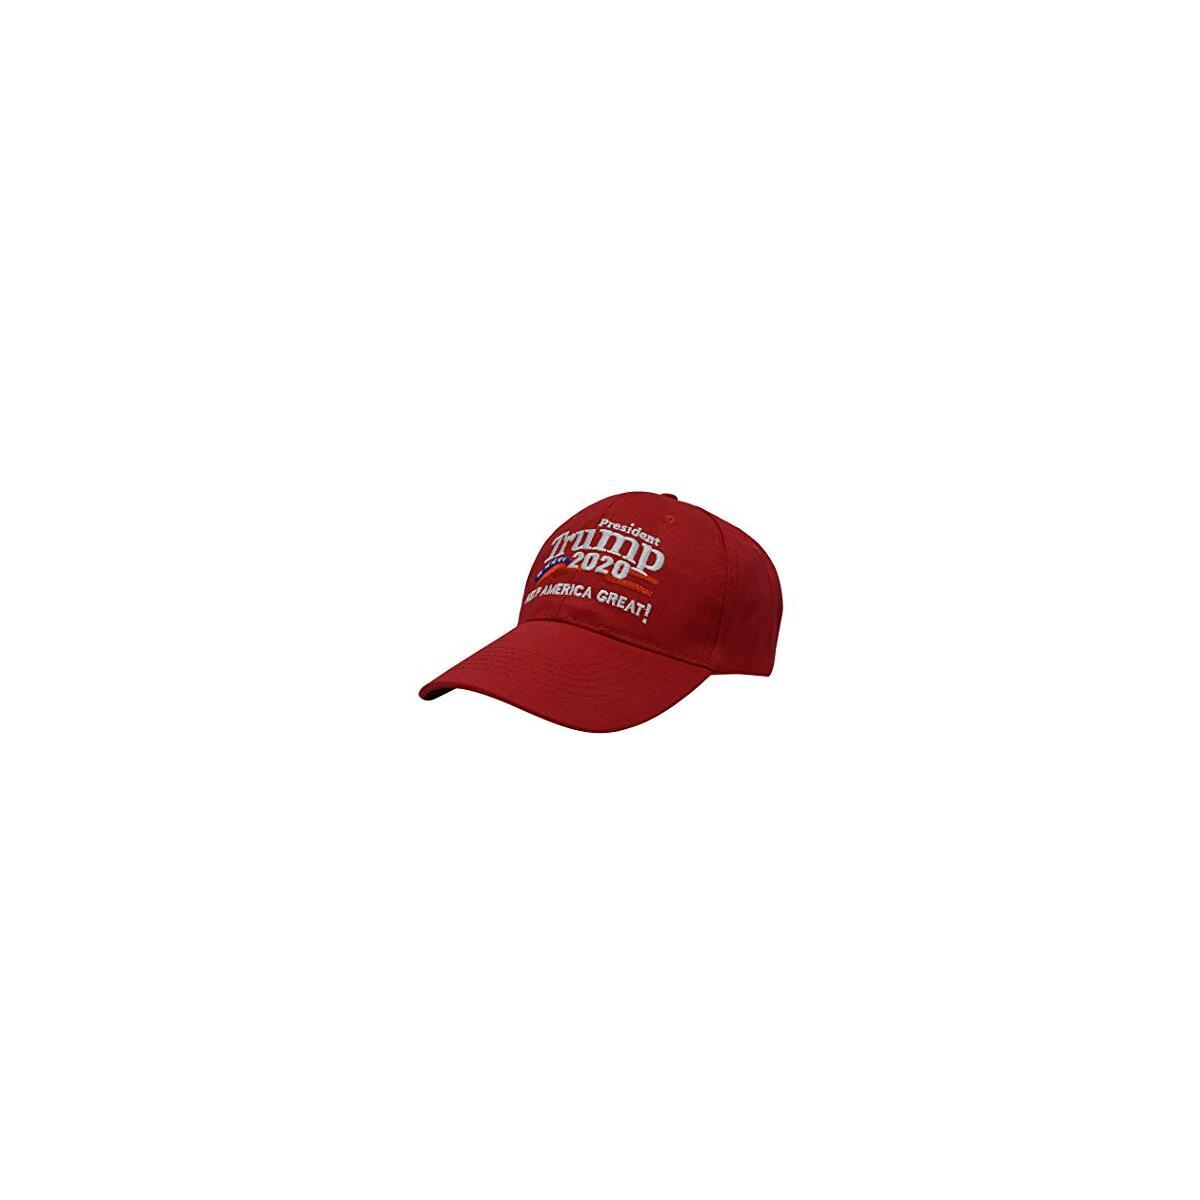 Trump 2020 Hat & Flag Keep America Great Campaign Embroidered/Printed Signature USA Baseball Cap